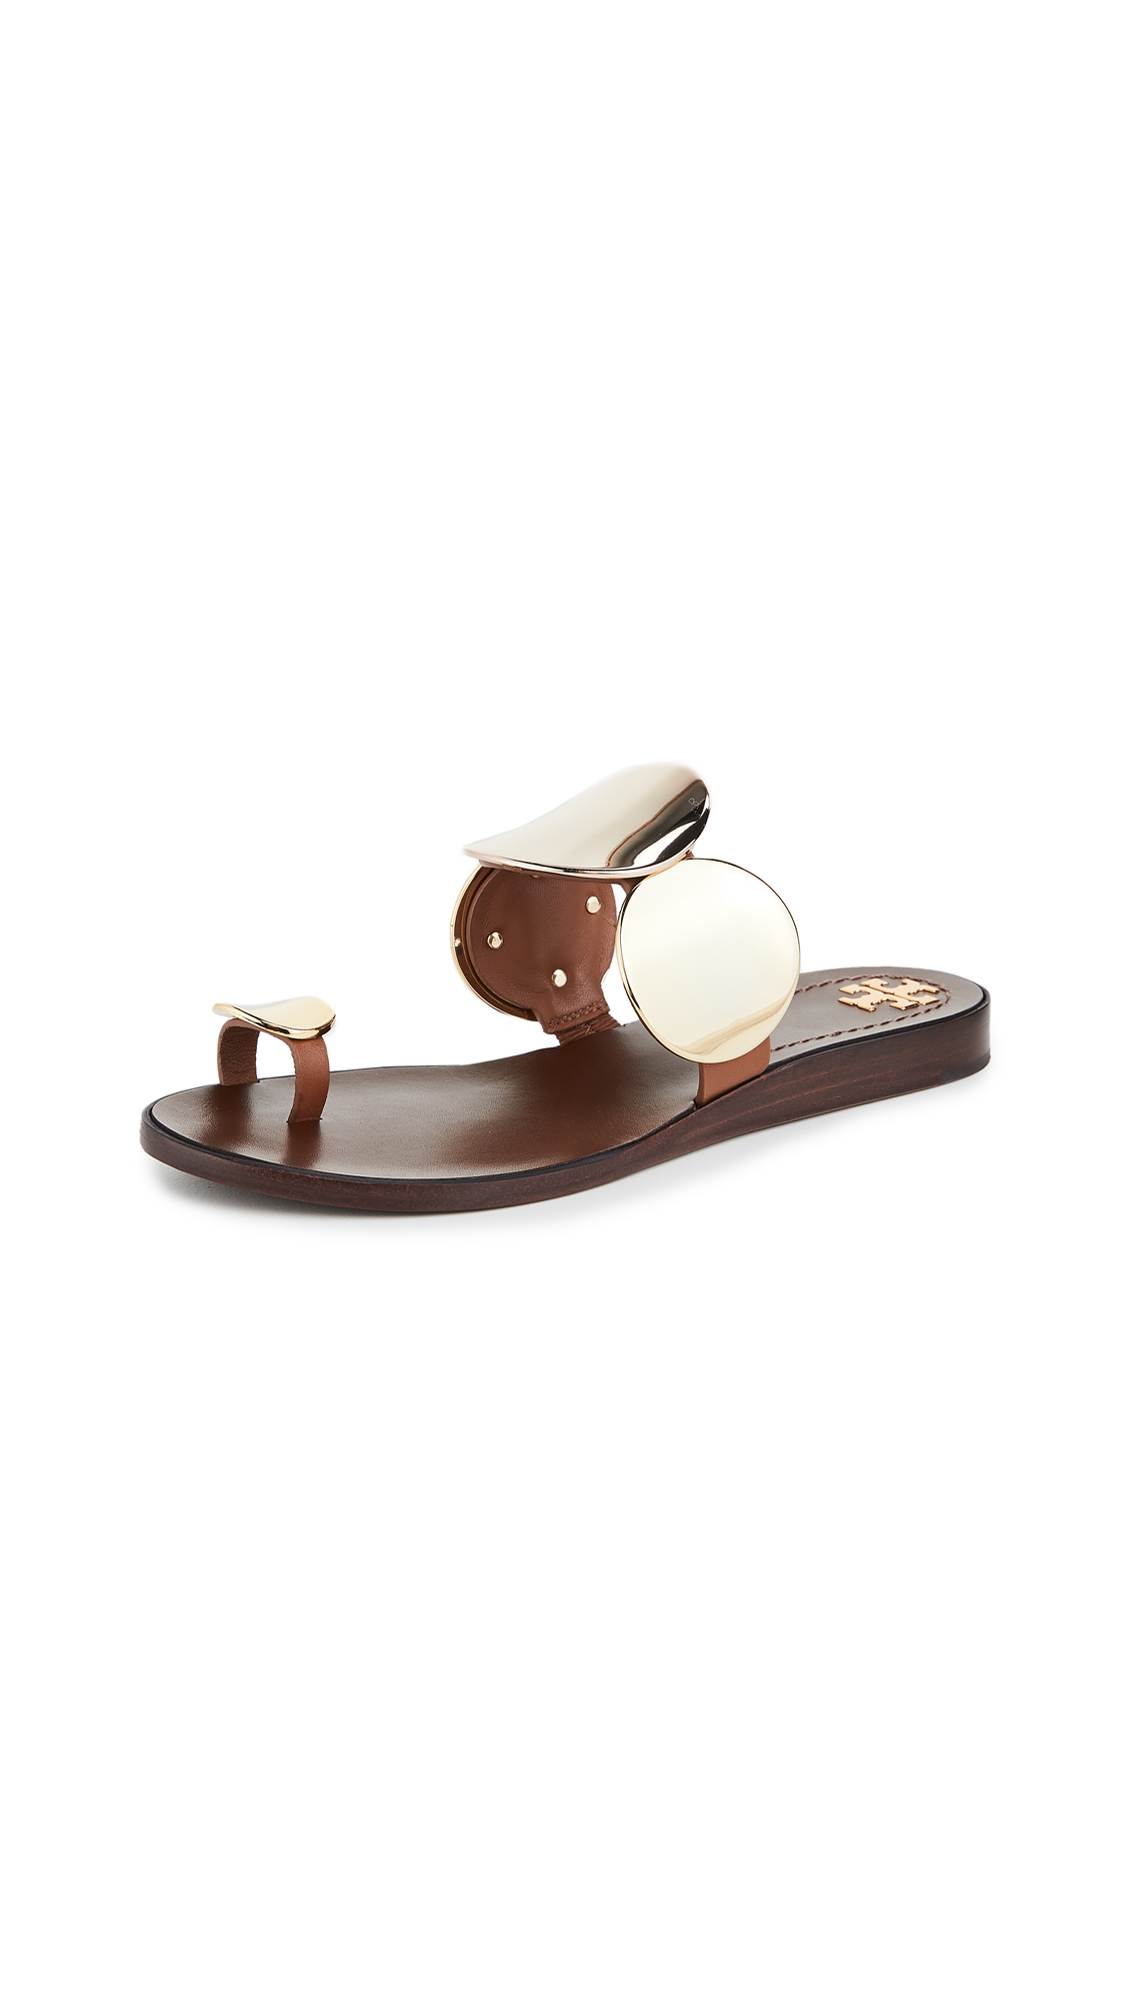 Buy Tory Burch Patos Multi Disk Sandals online, shop Tory Burch